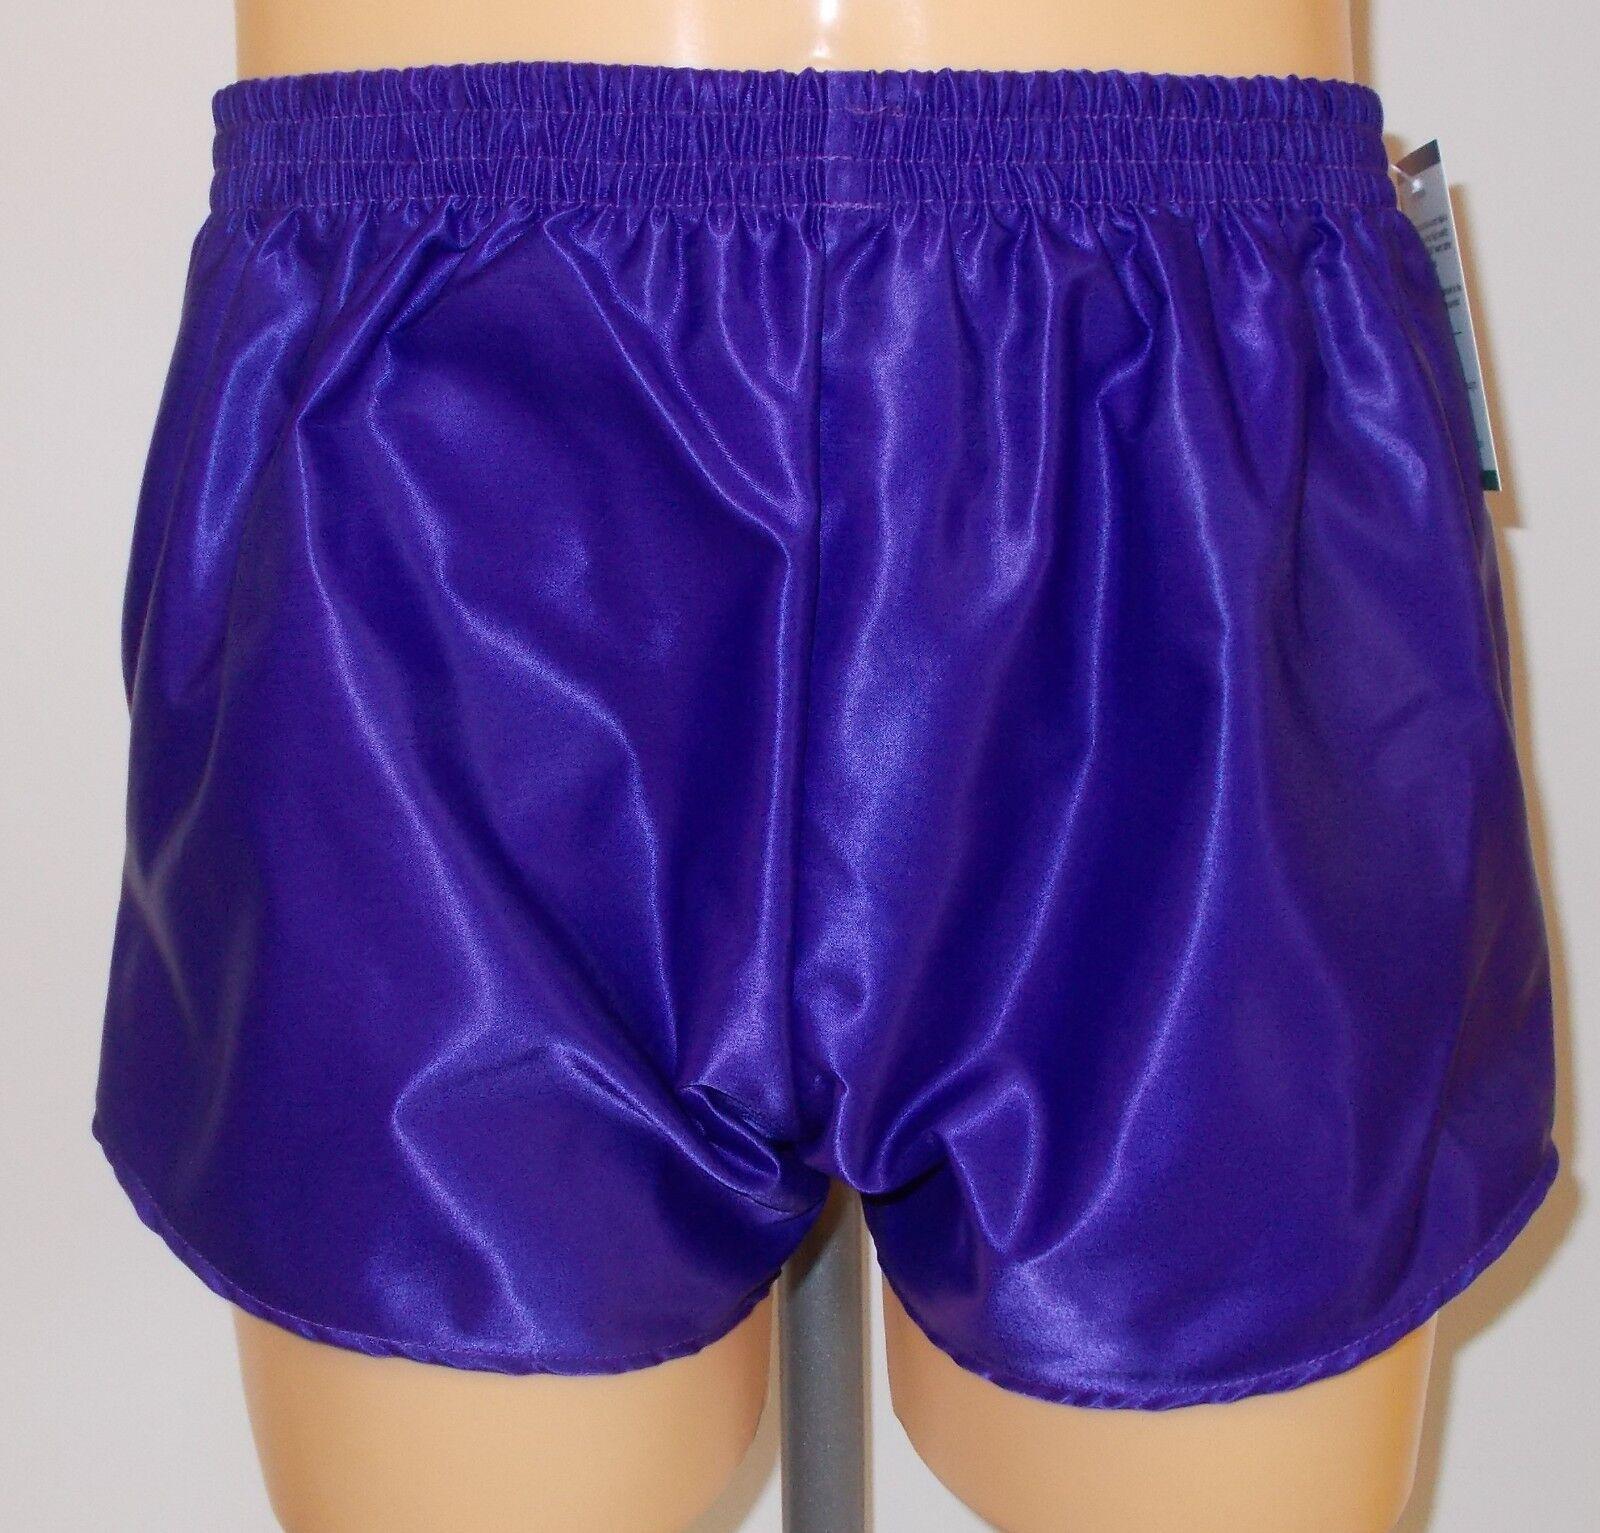 Retro Nylon Satin Fußball Shorts S zu 4XL, Einfarbig purplet